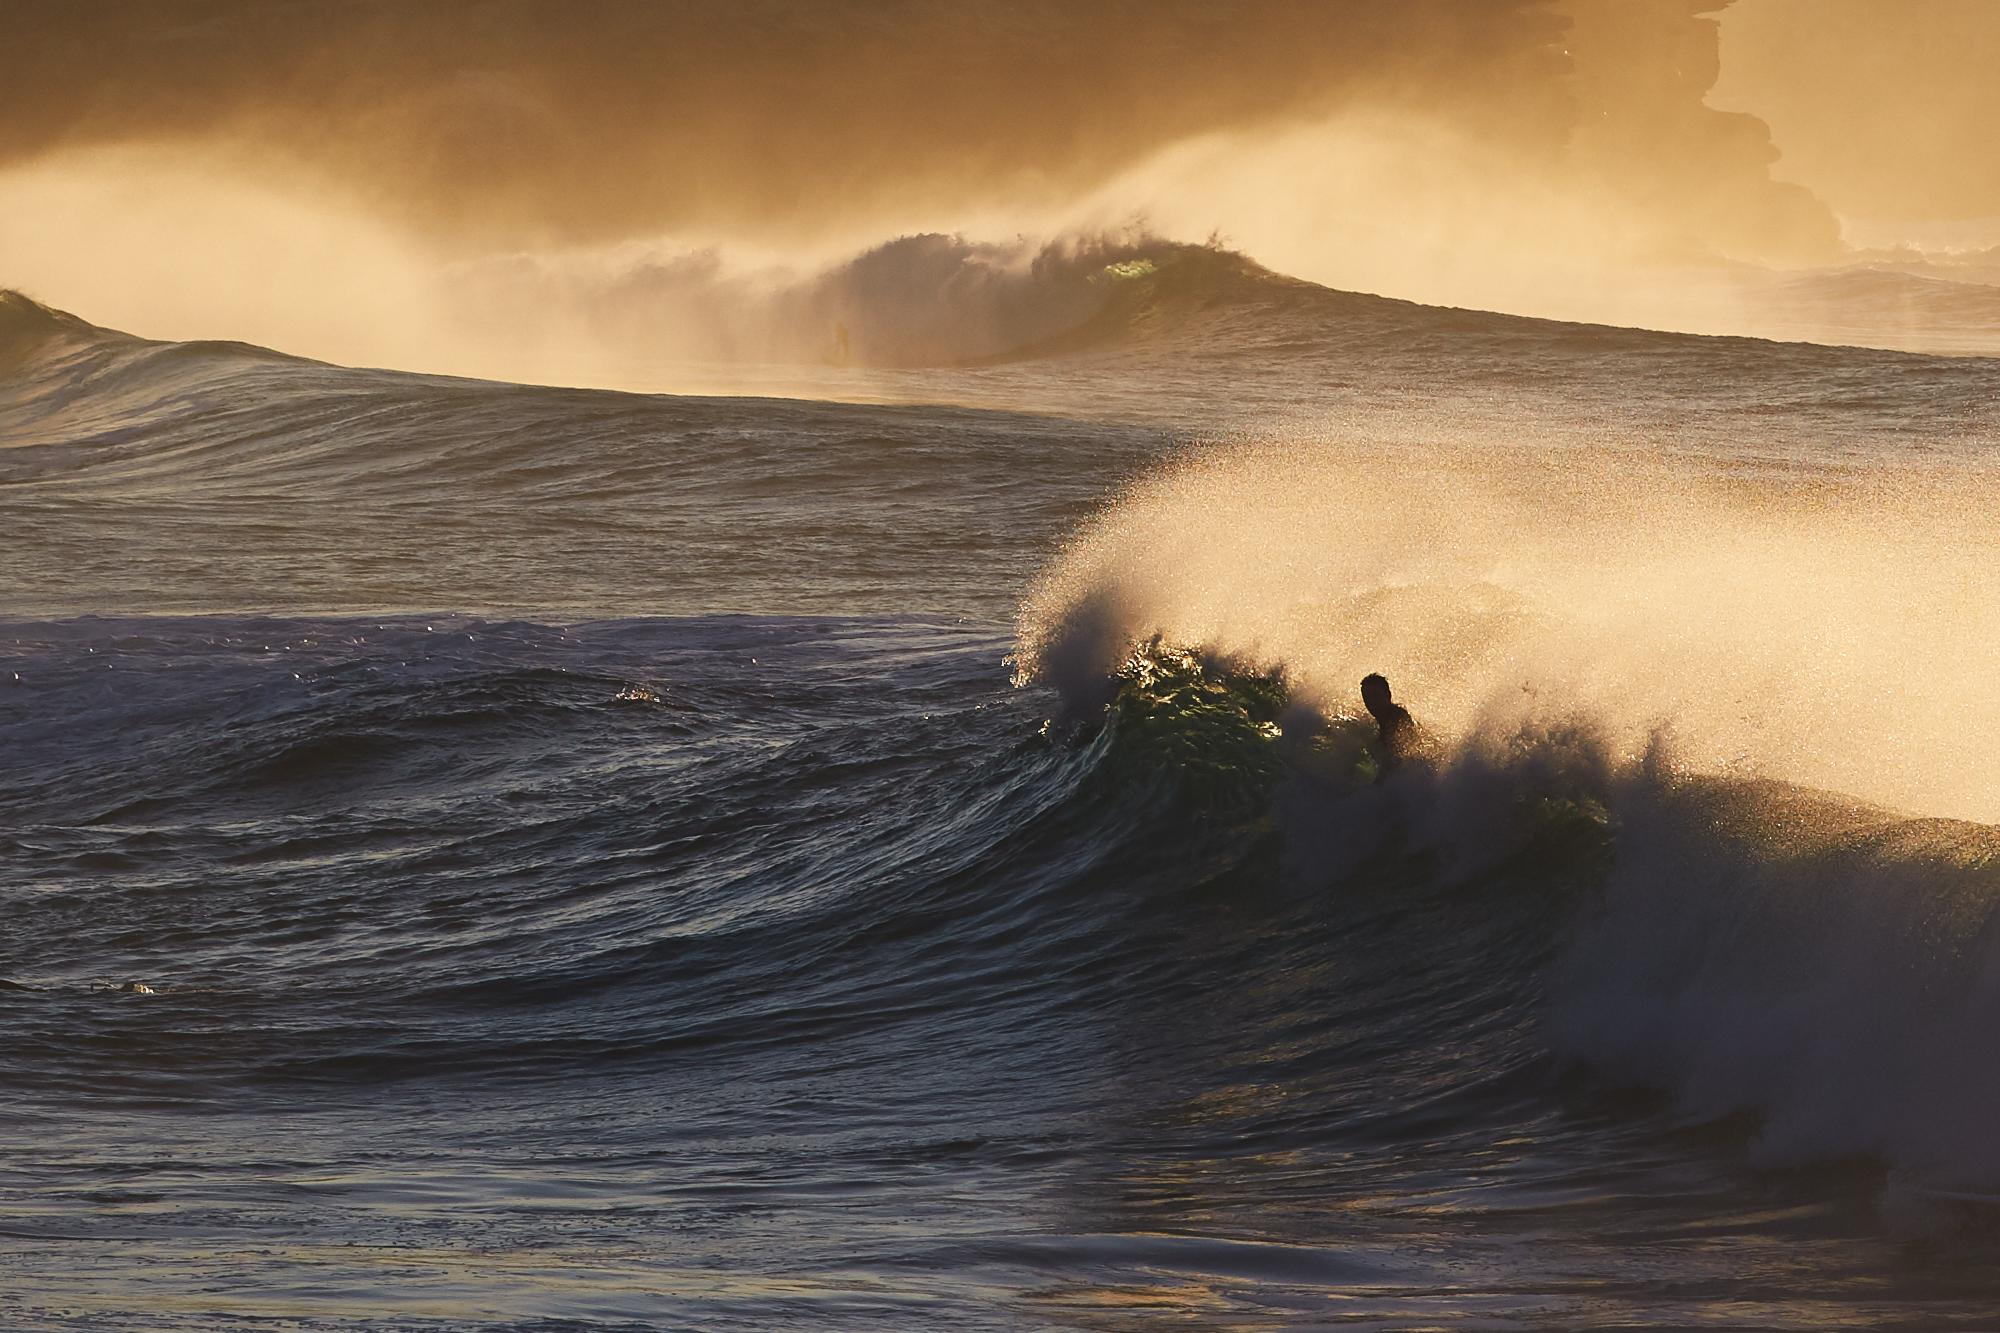 Surfing in Bronte